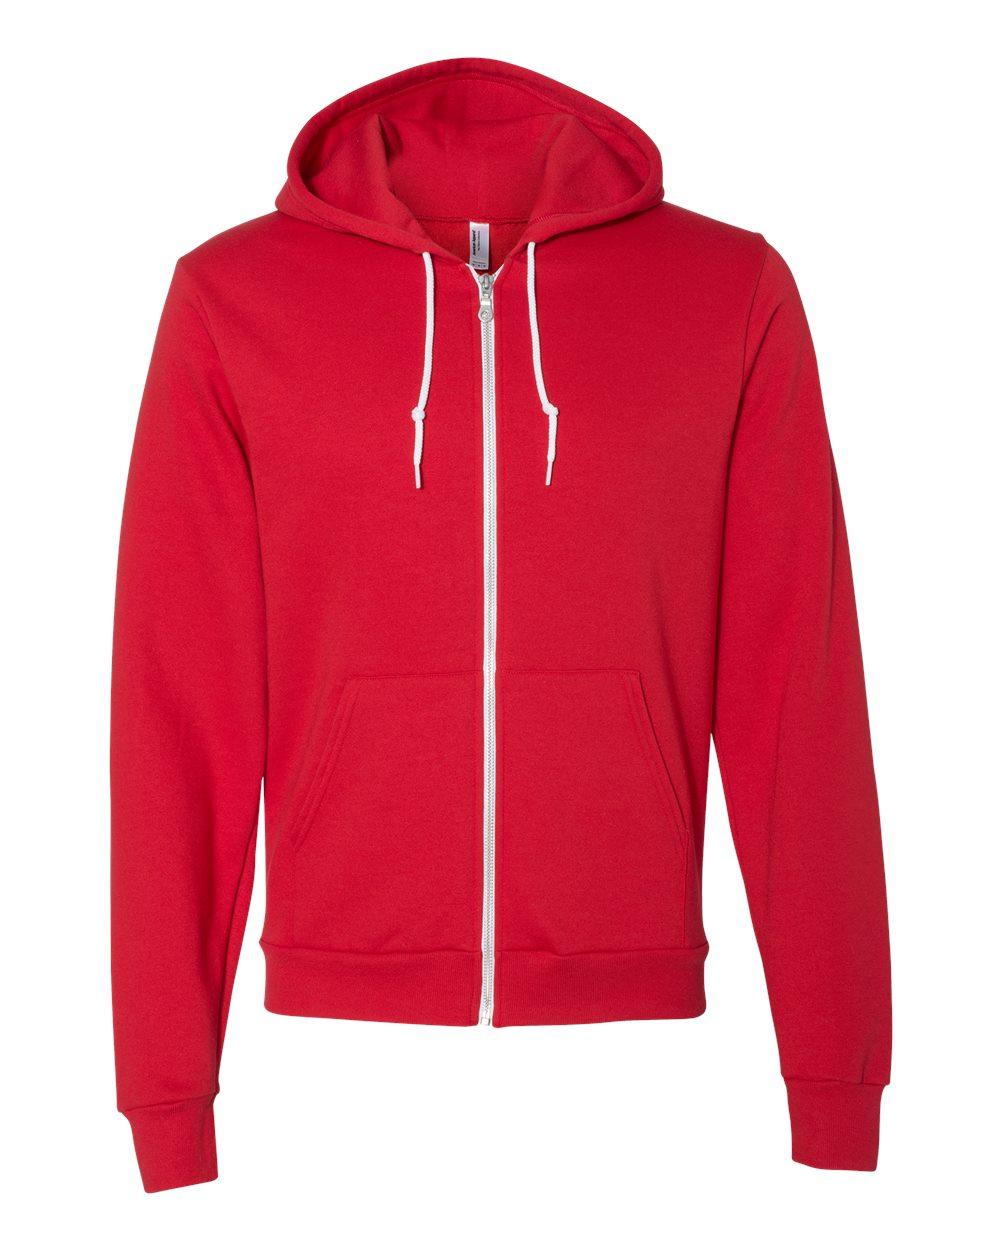 American-Apparel-Flex-Fleece-Unisex-Full-Zip-Hoodie-Blank-F497W-up-to-3XL thumbnail 12